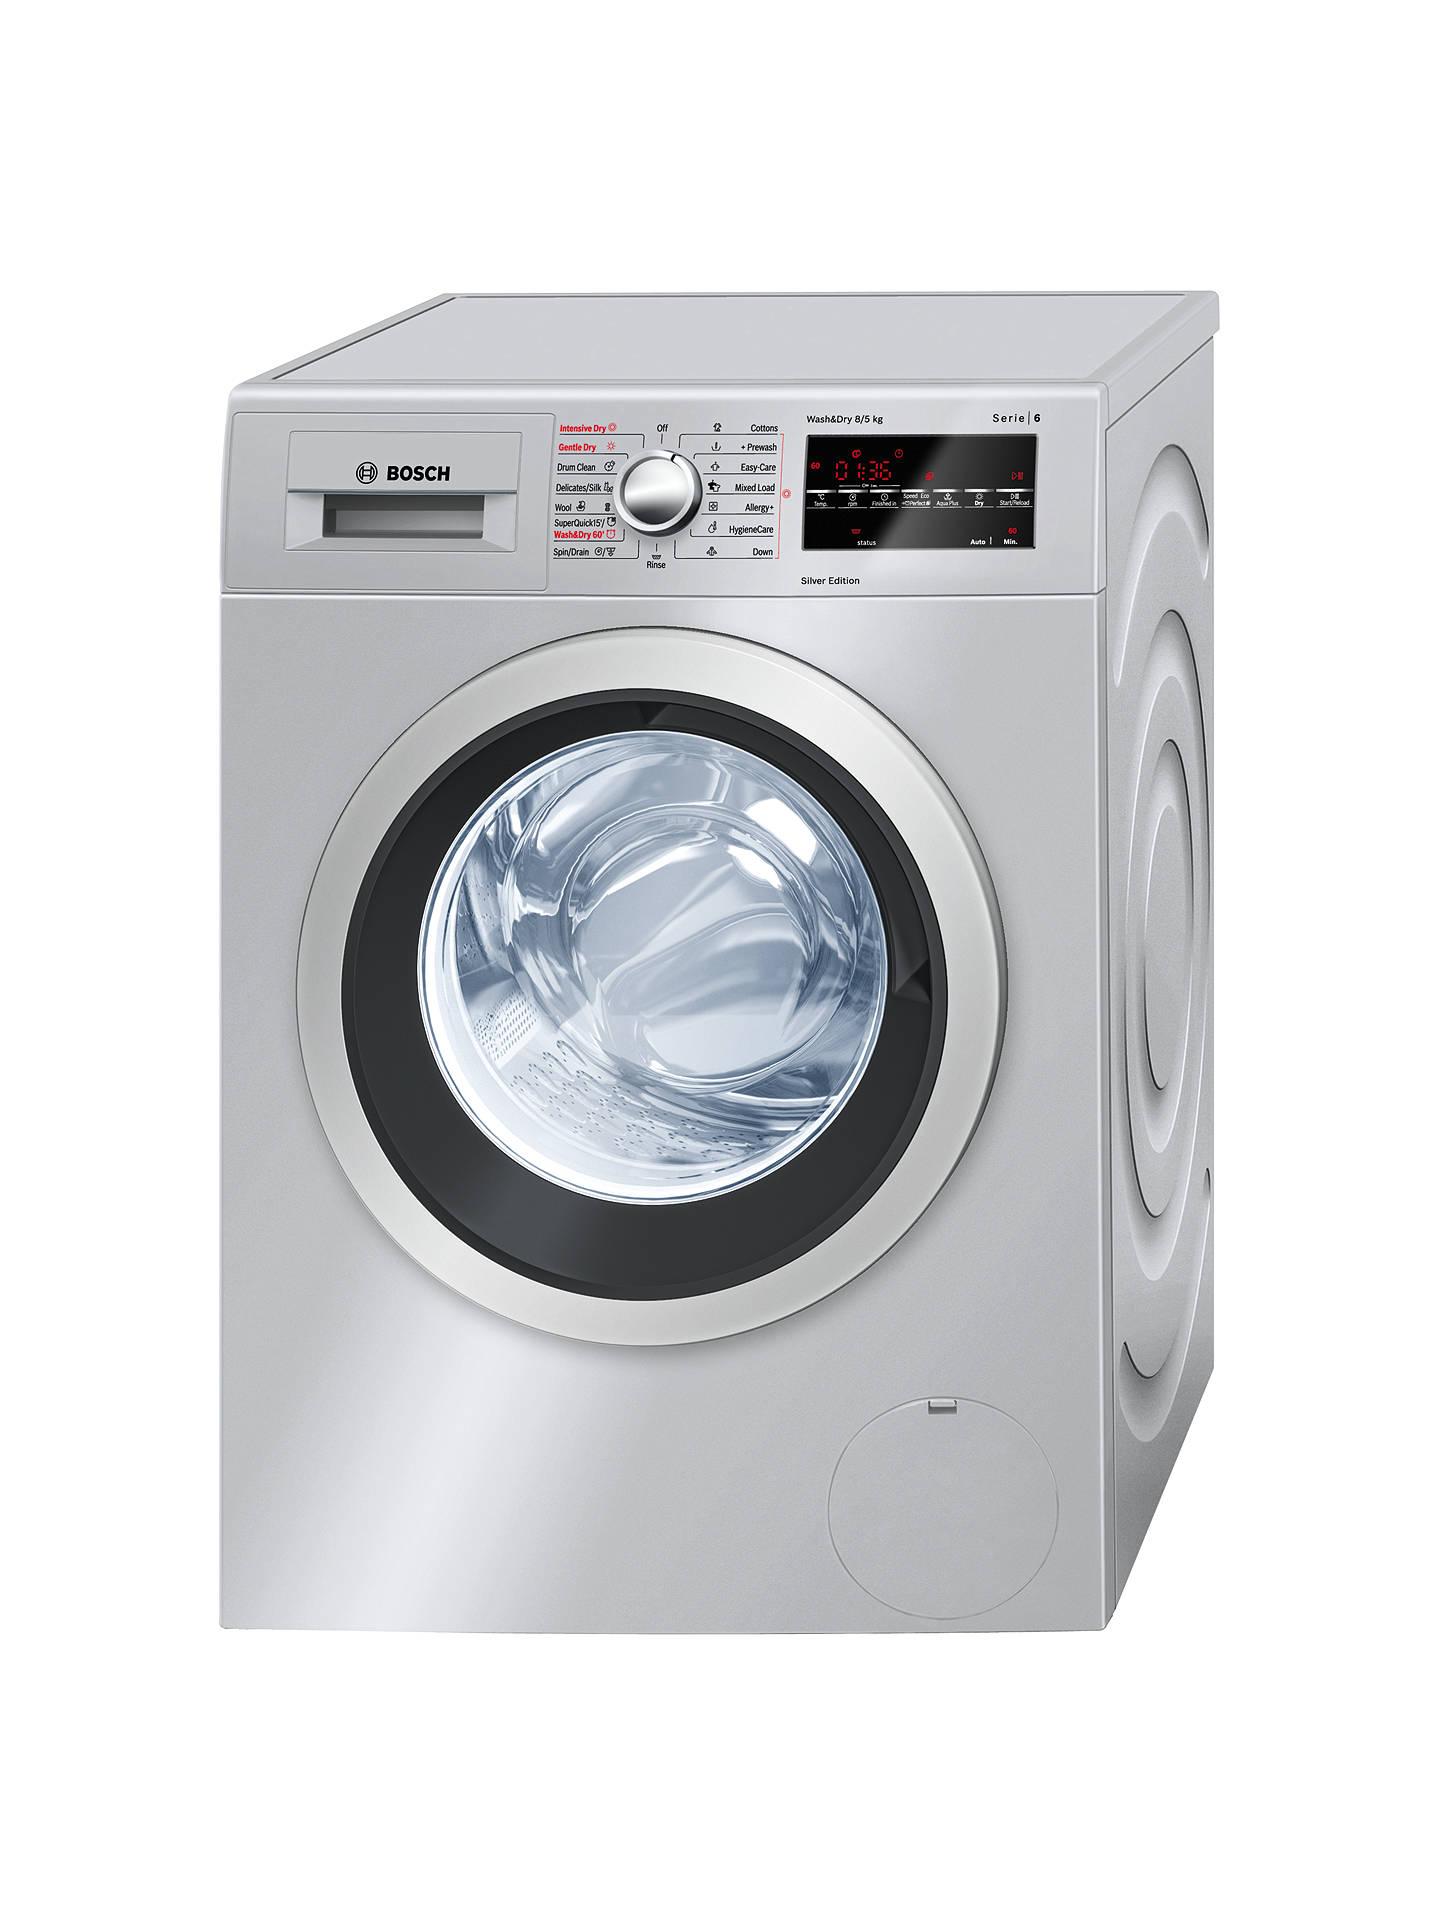 Bosch Wvg3046sgb Washer Dryer 8kg Wash 5kg Dry Load A Energy Rating